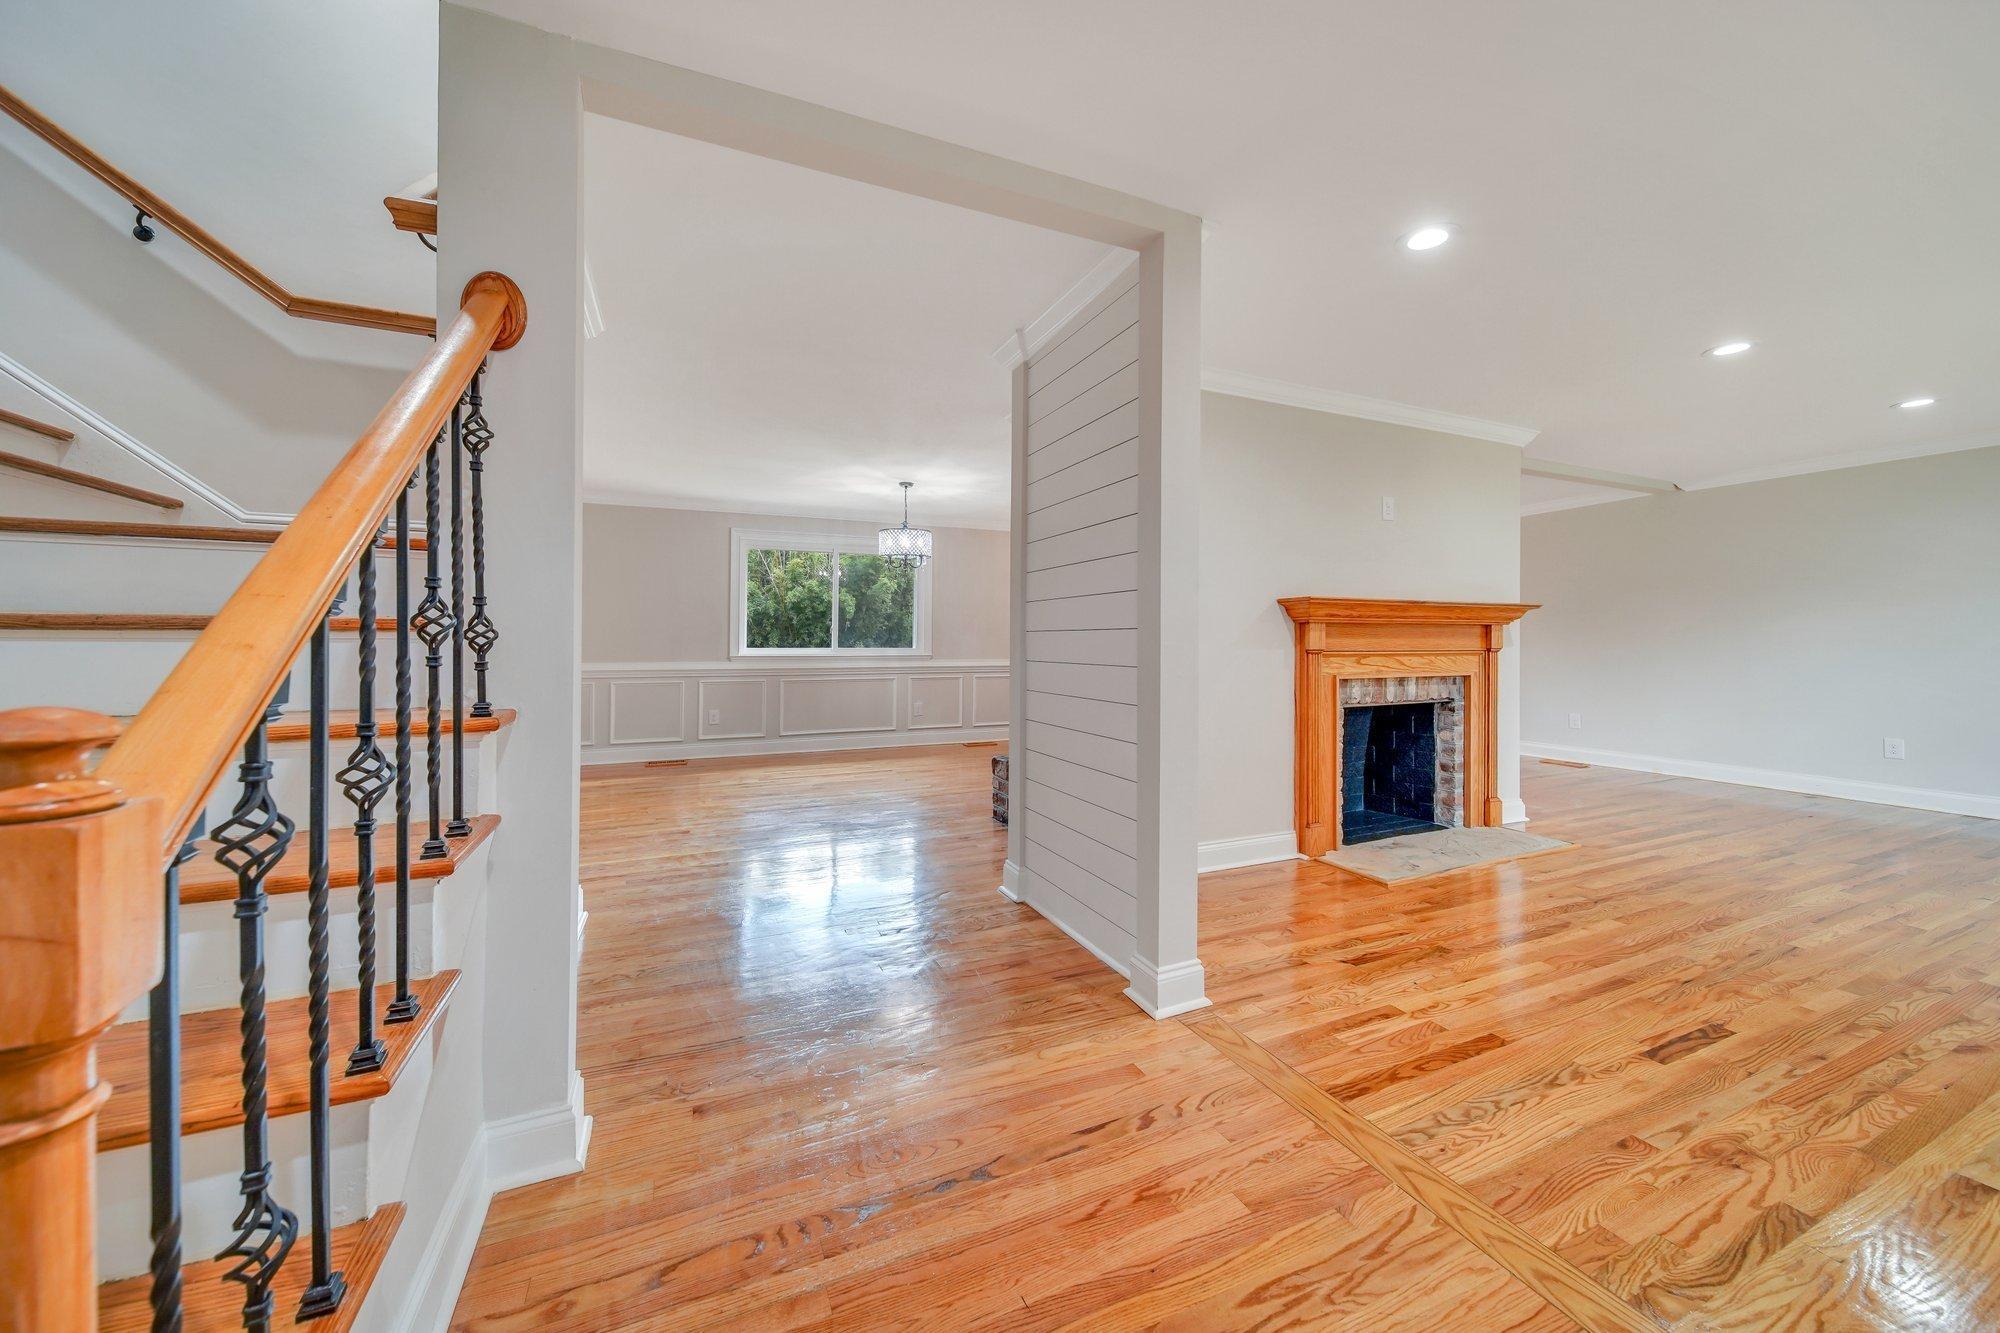 Country Club II Homes For Sale - 1477 Burningtree, Charleston, SC - 12